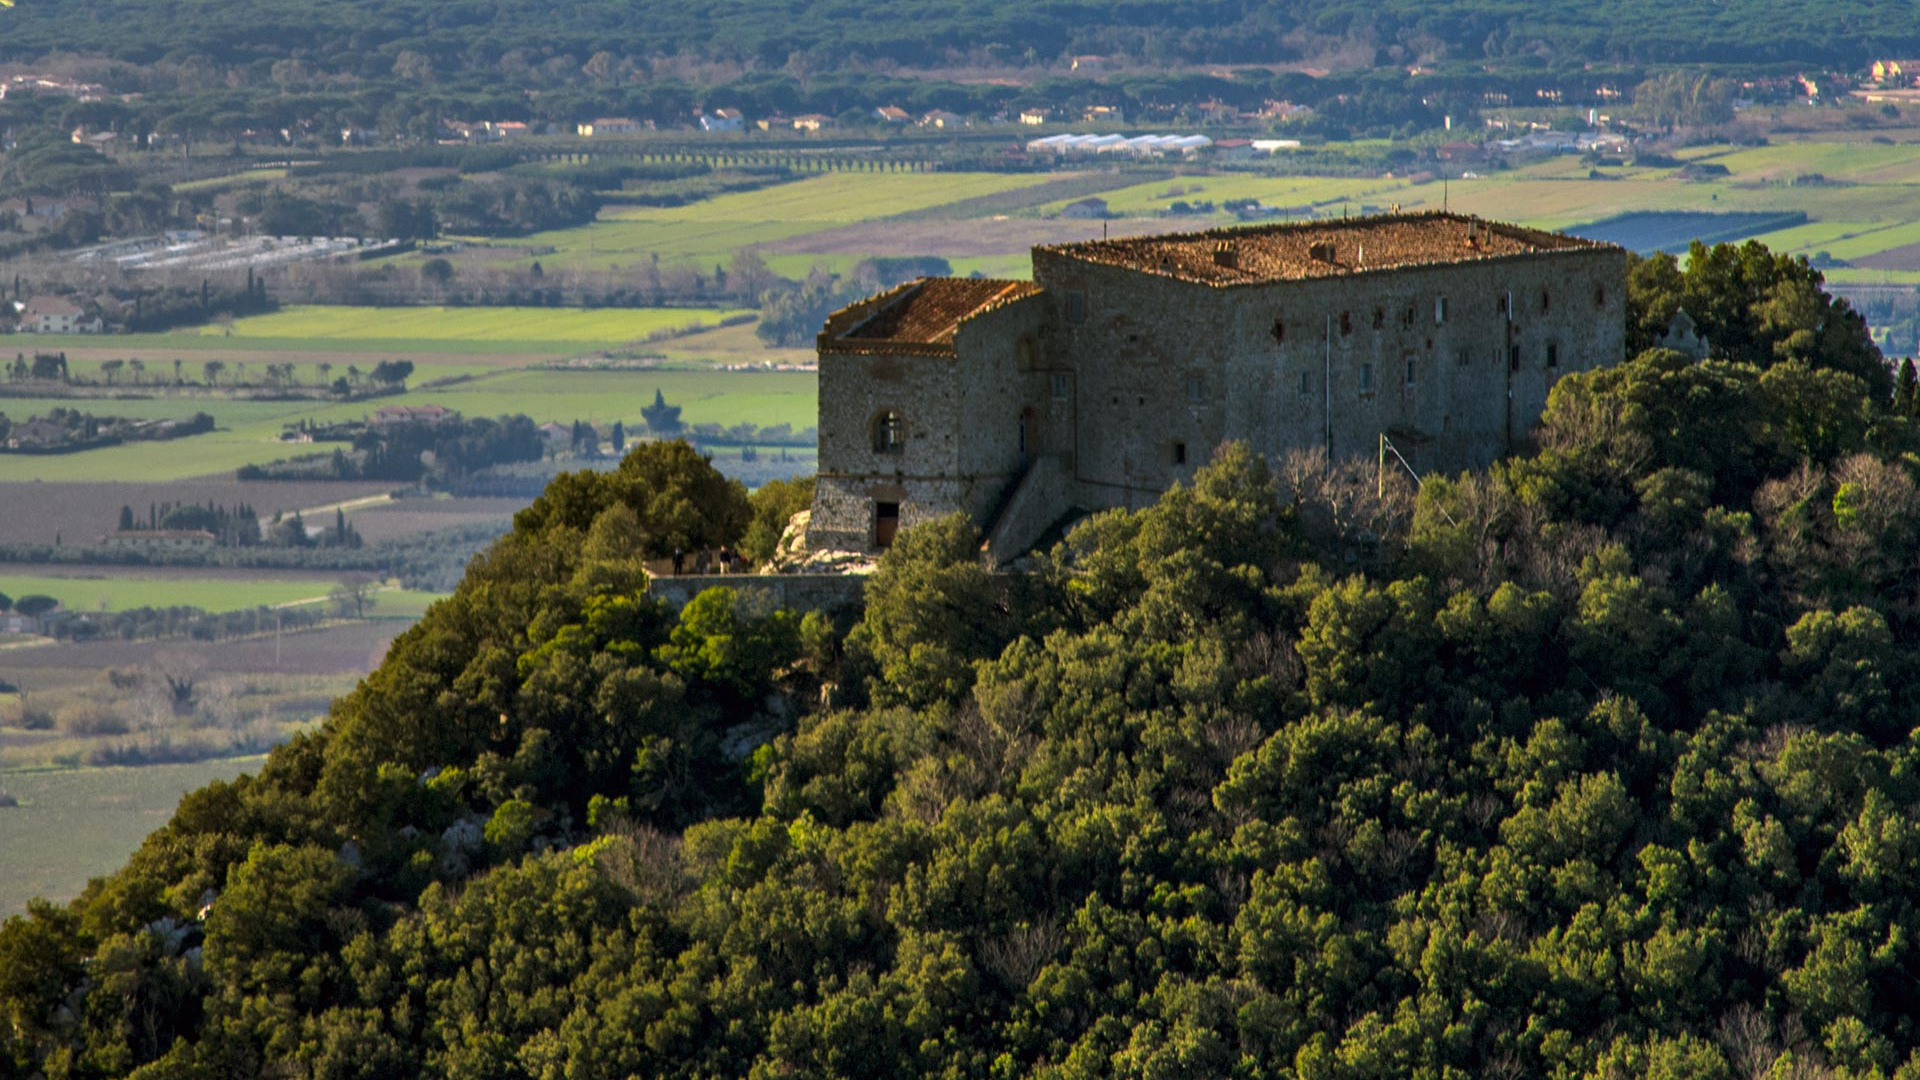 The Tentu San Guido estate in Tuscany